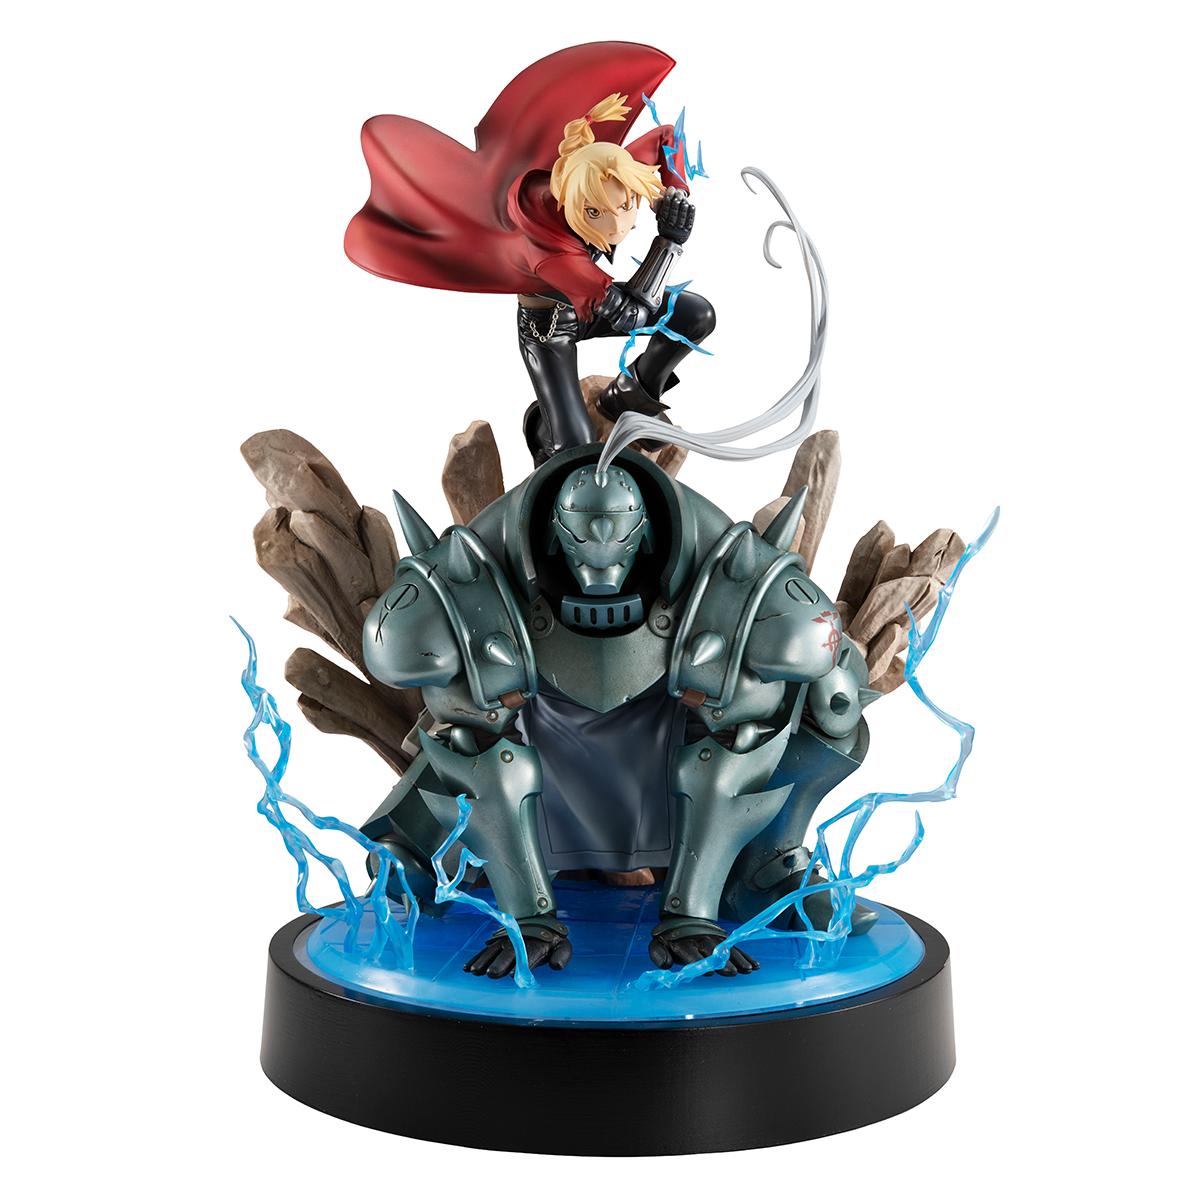 Edward & Alphonse Elric Fullmetal Alchemist Precious GEM Figure